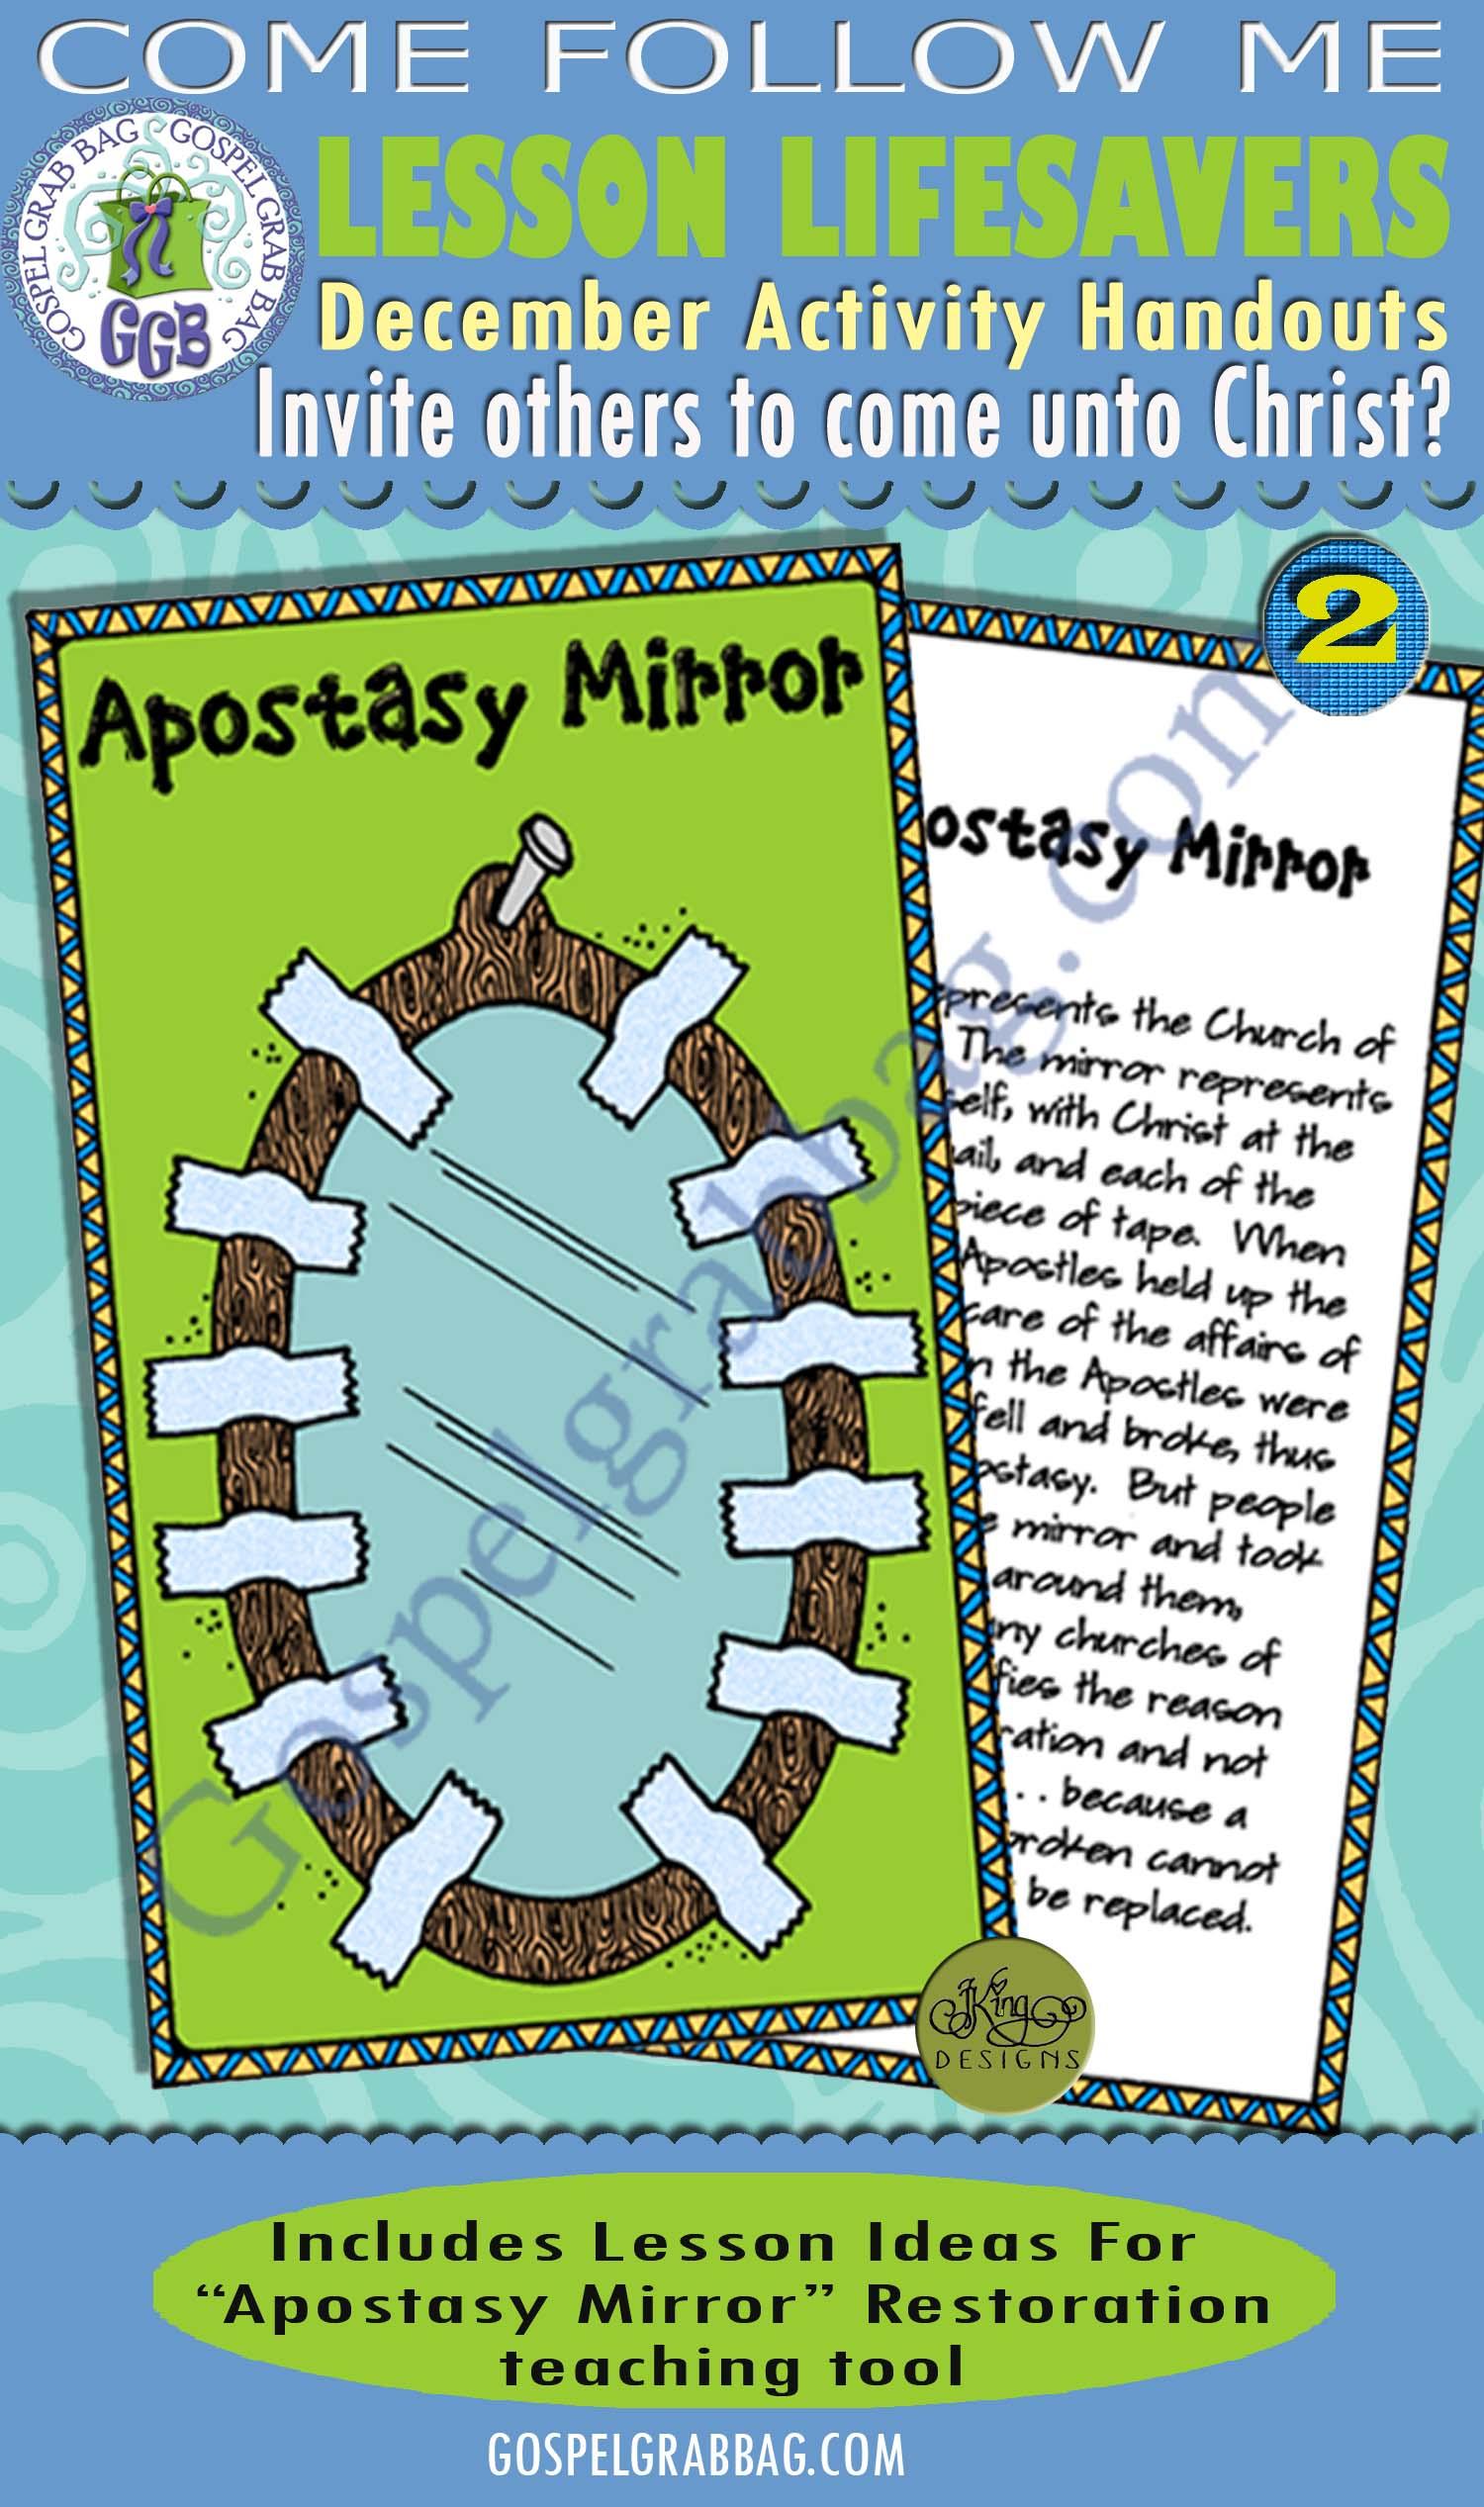 "$1.75 December Lesson 1 - Come Follow Me ""How can I invite others to come unto Christ?"" ACTIVITY: Apostasy Mirror - Restoration teaching tool, GospelGrabBag.com"